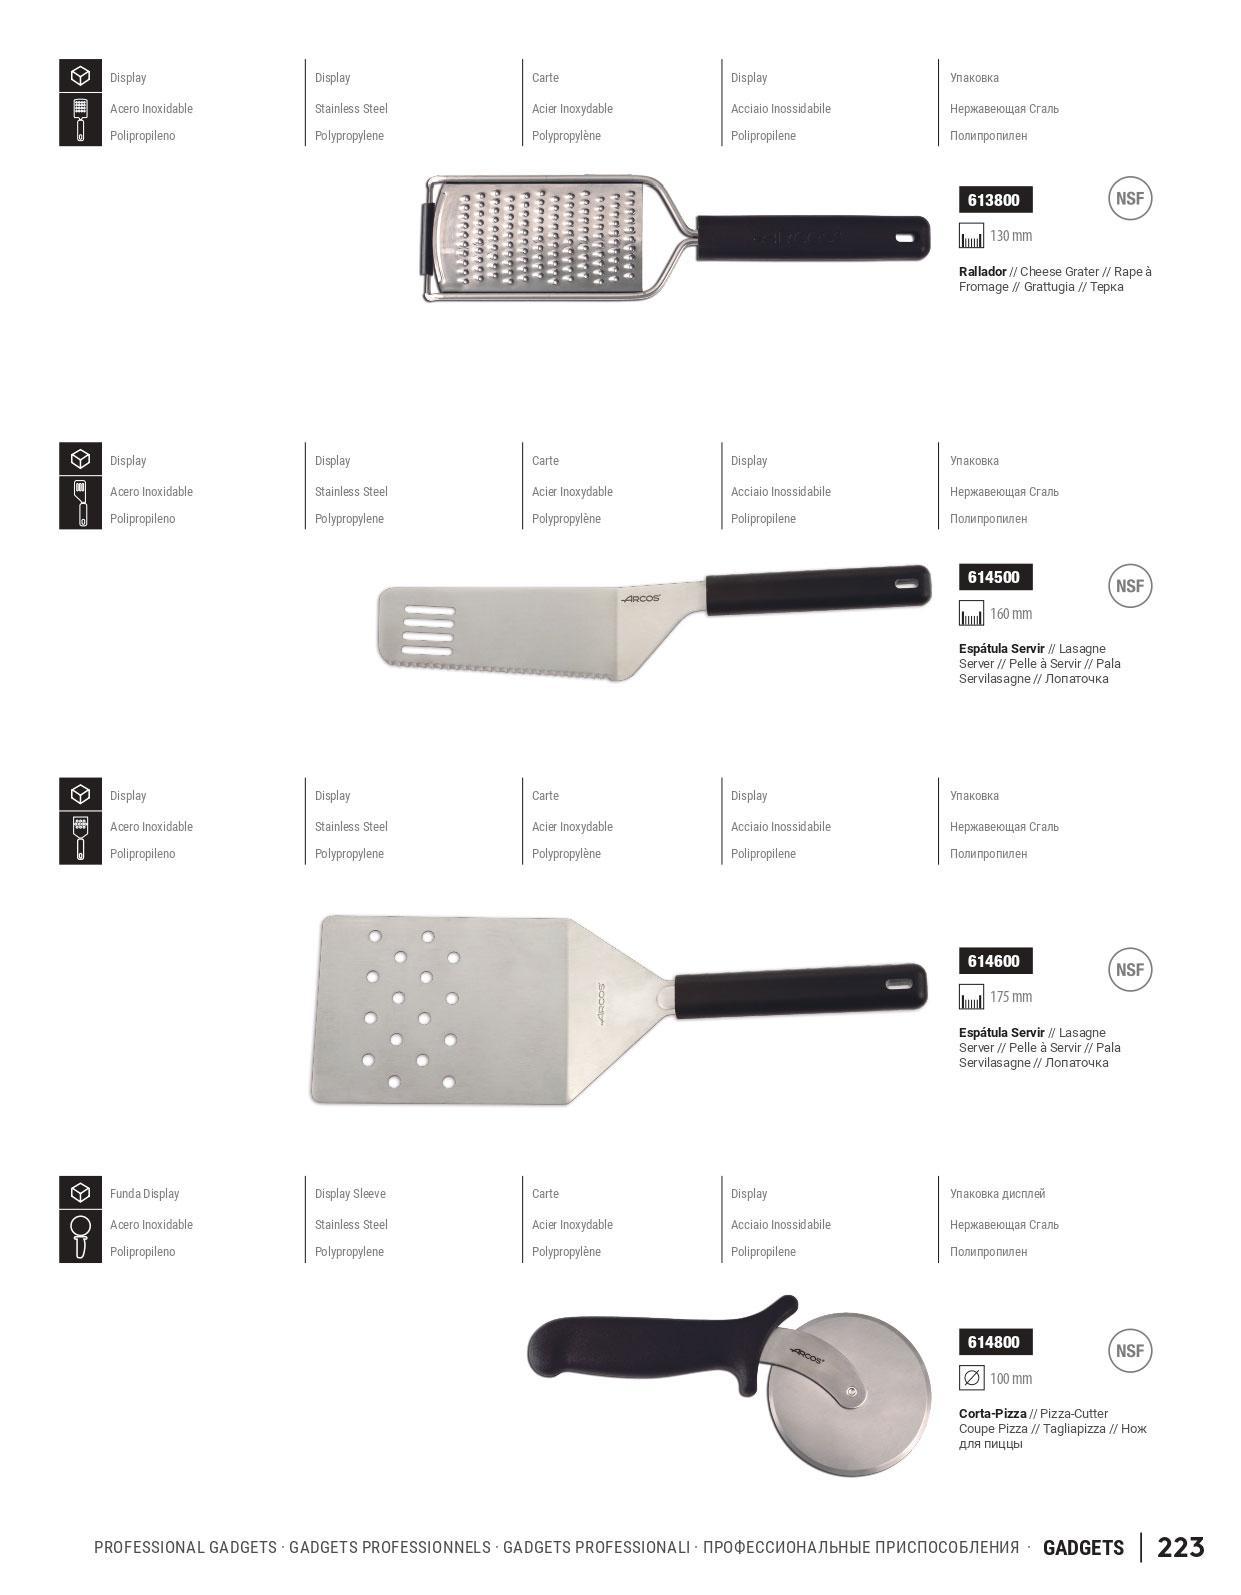 Utensilios De Cocina Profesional | 614800 Gadgets Profesionales Arcos Menaje Cocina Utensilios